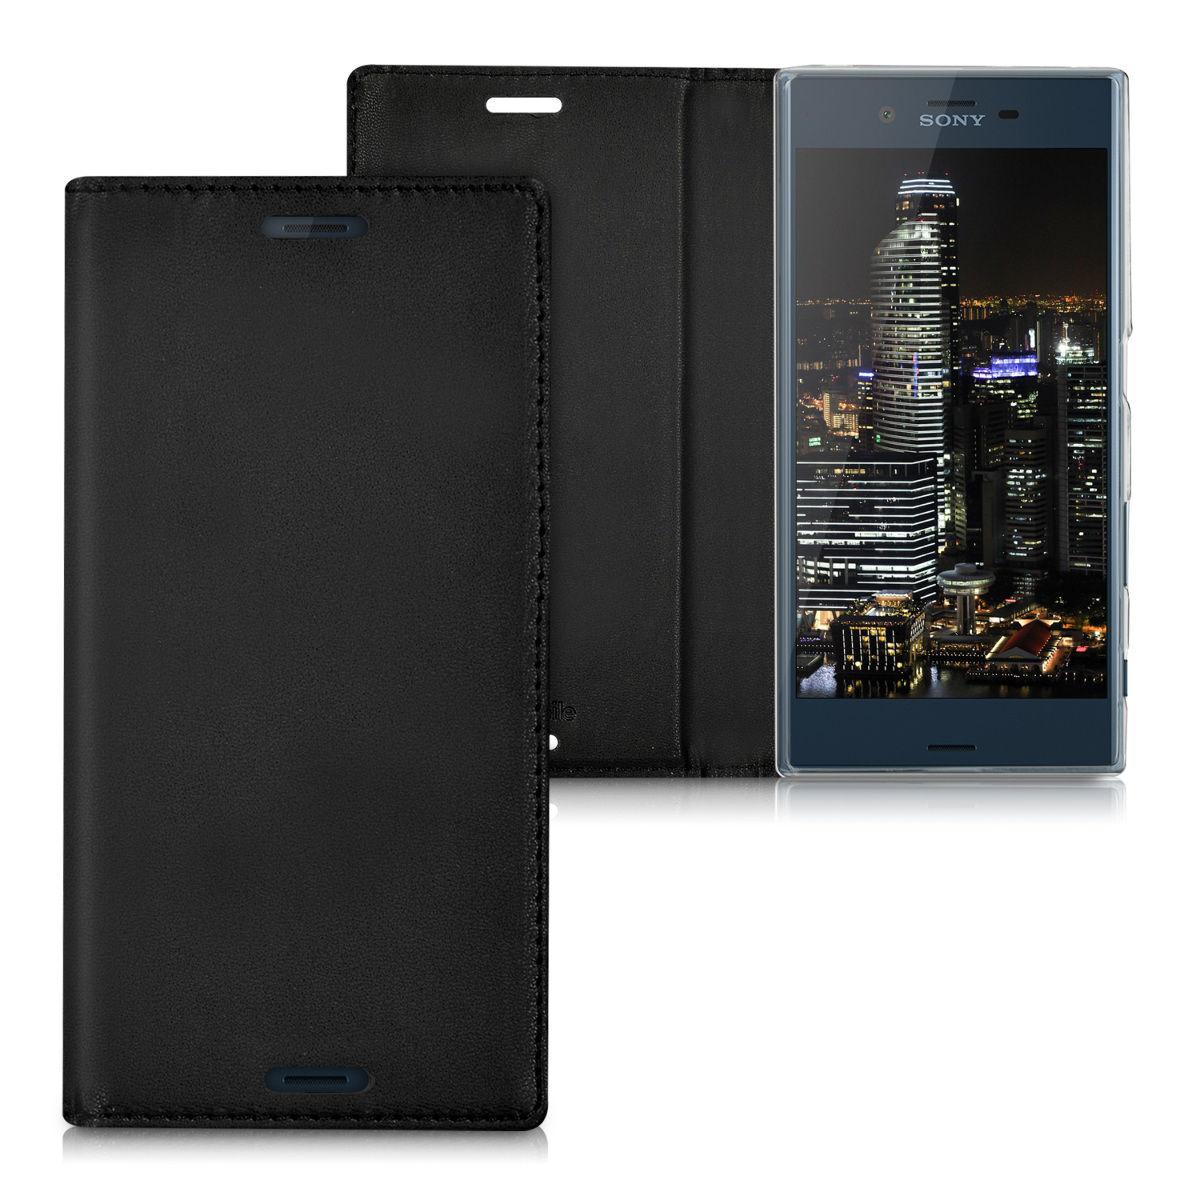 Pouzdro pro Sony Xperia XZ černé